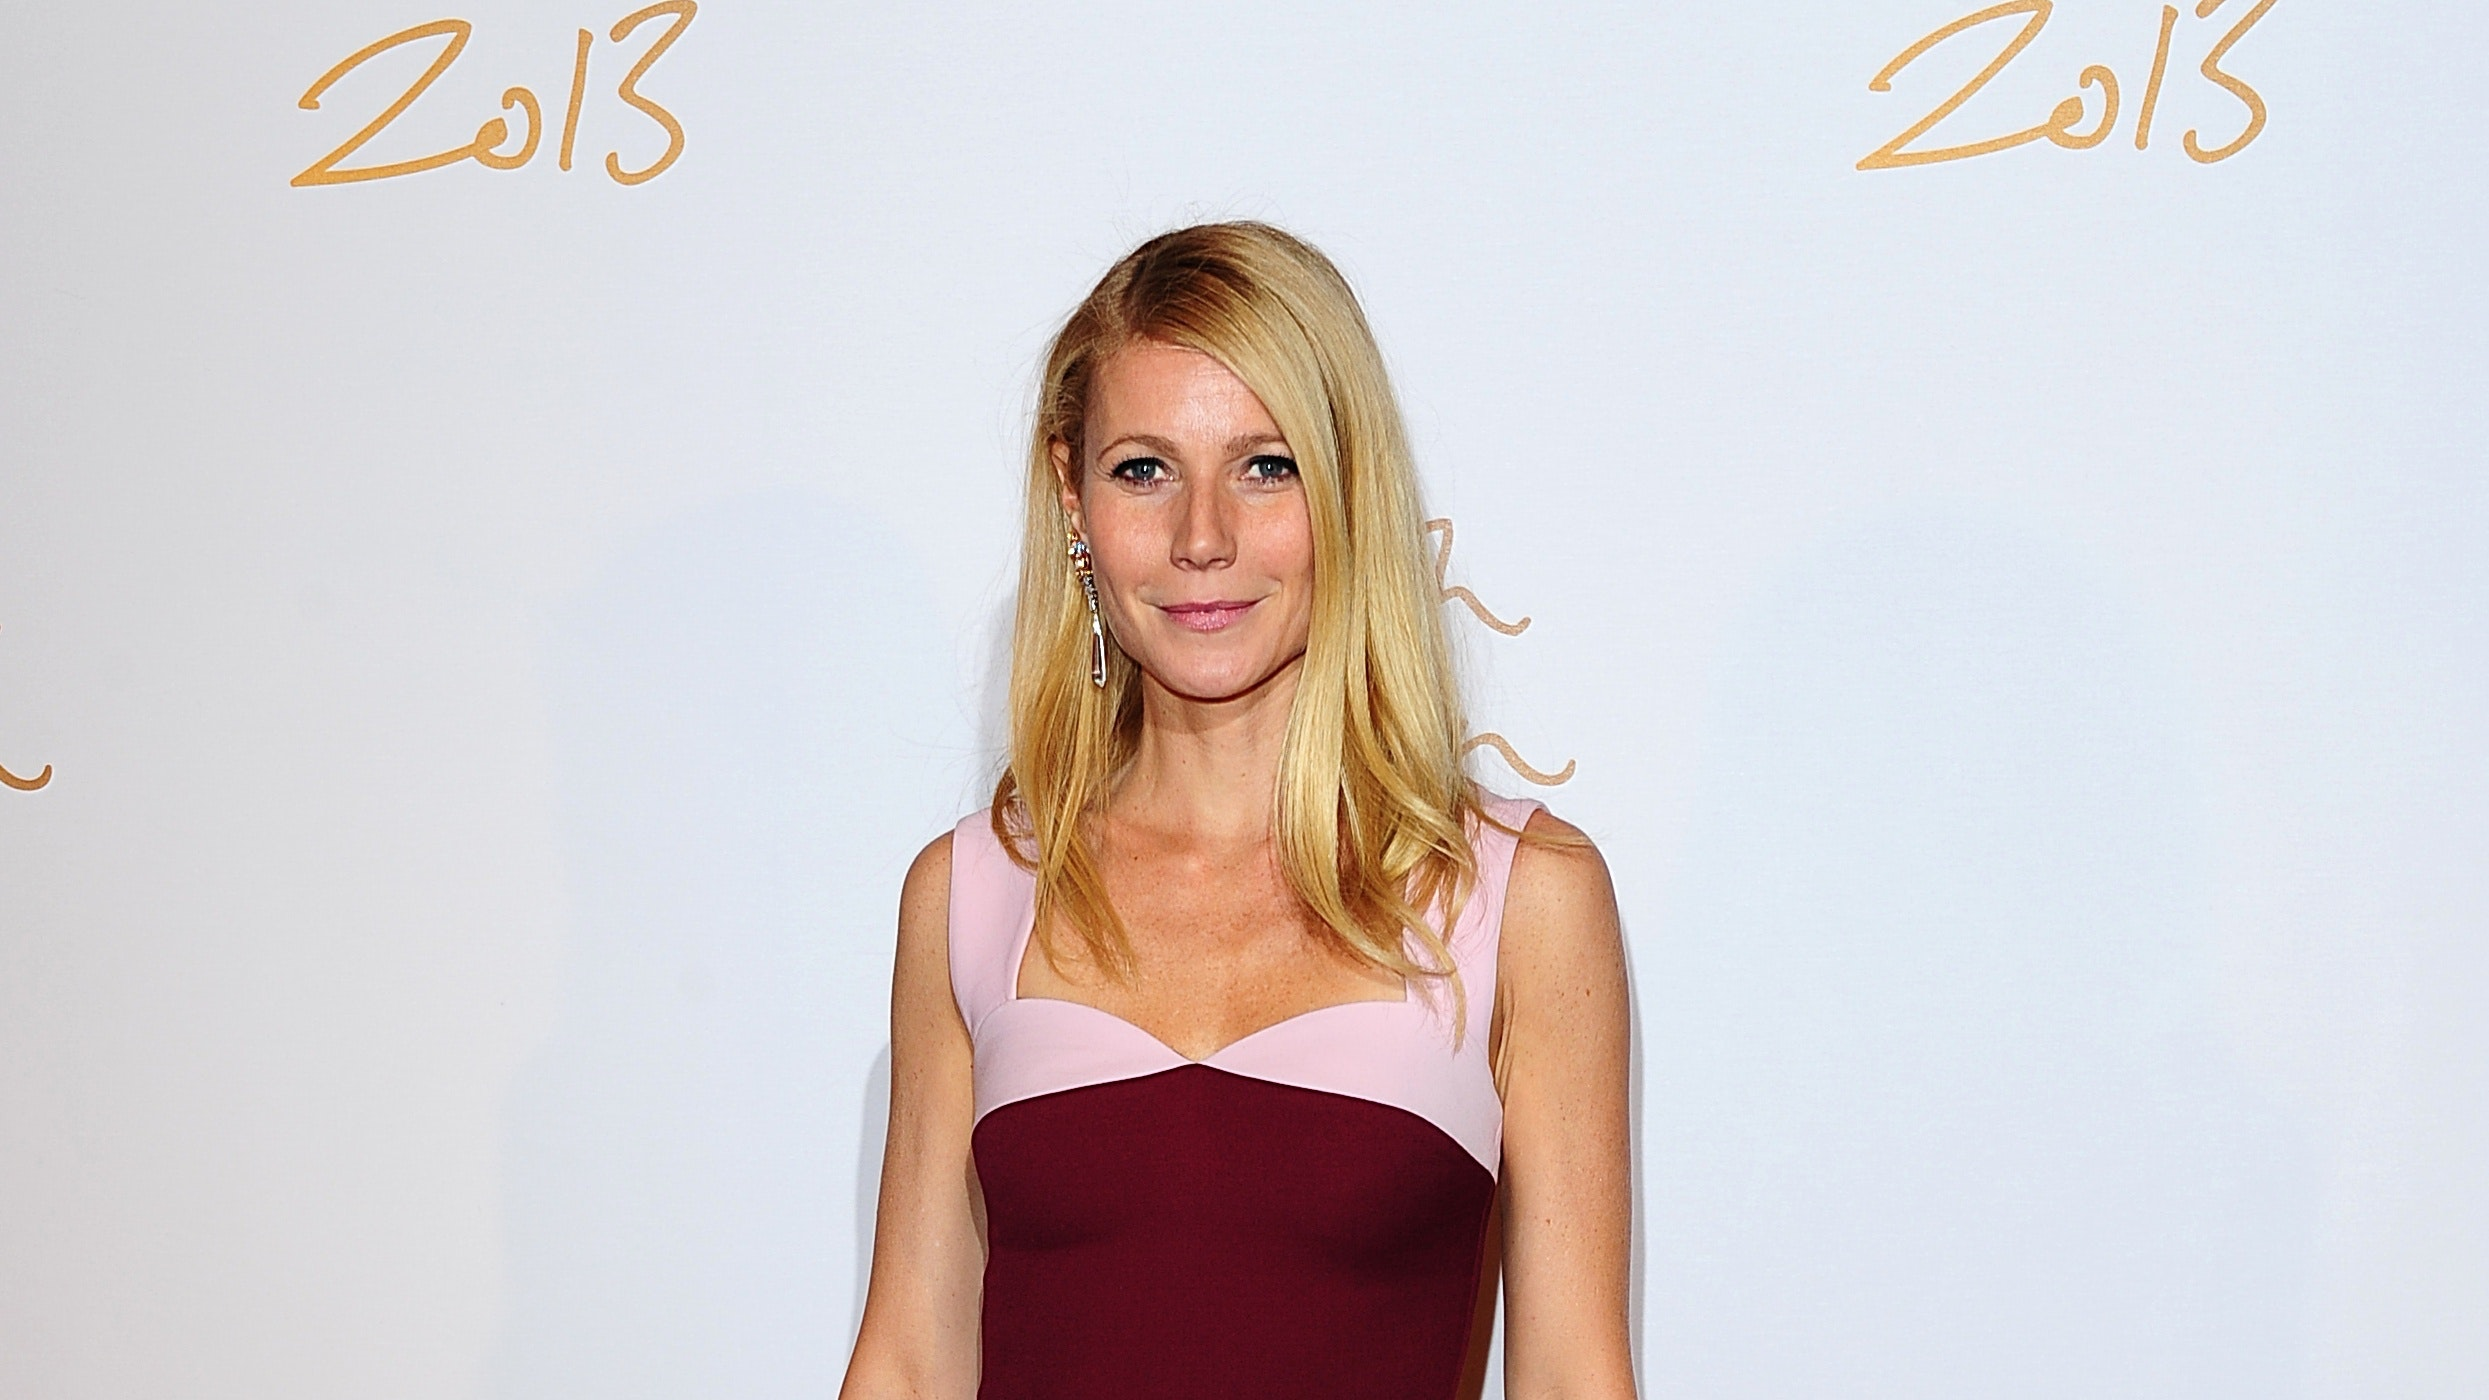 Embarrassing mum alert: Gwyneth Paltrow selfie upsets her daughter